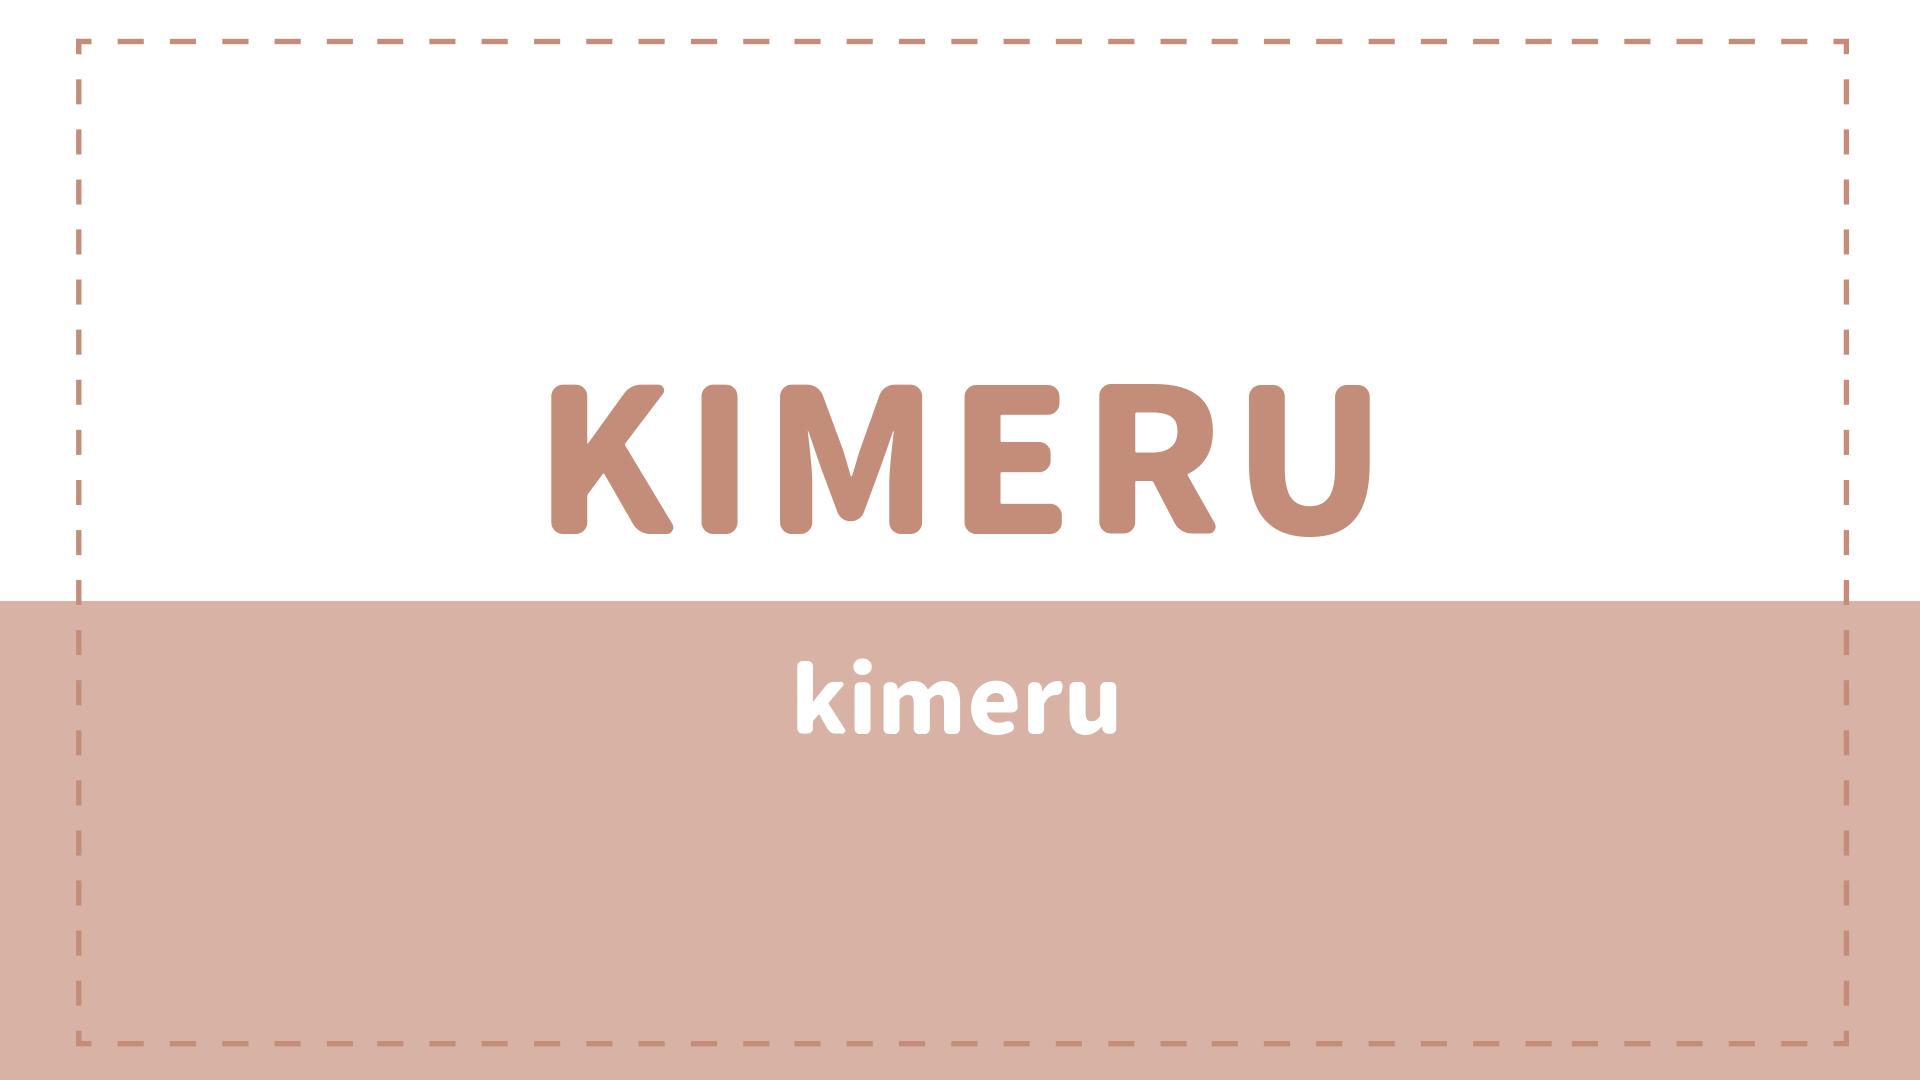 KIMERUの本名や結婚は?ババアの由来や彼女がいるのかも気になる